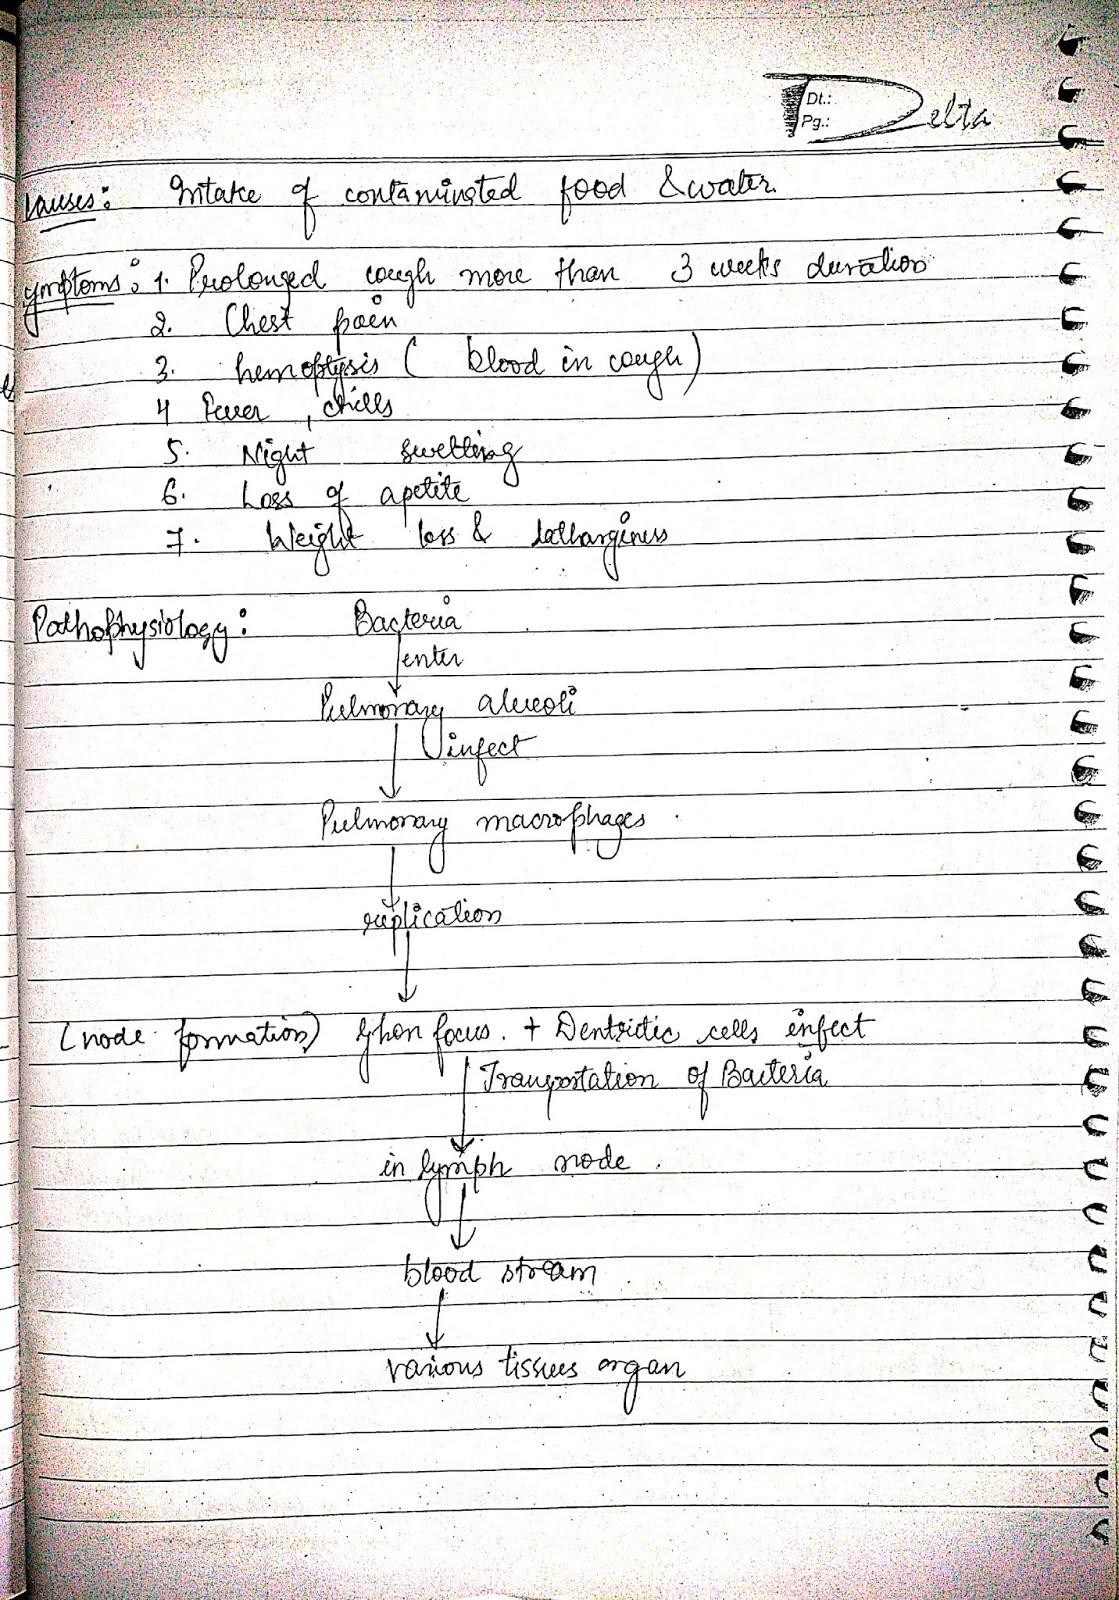 pathophysiology - tuberculosis